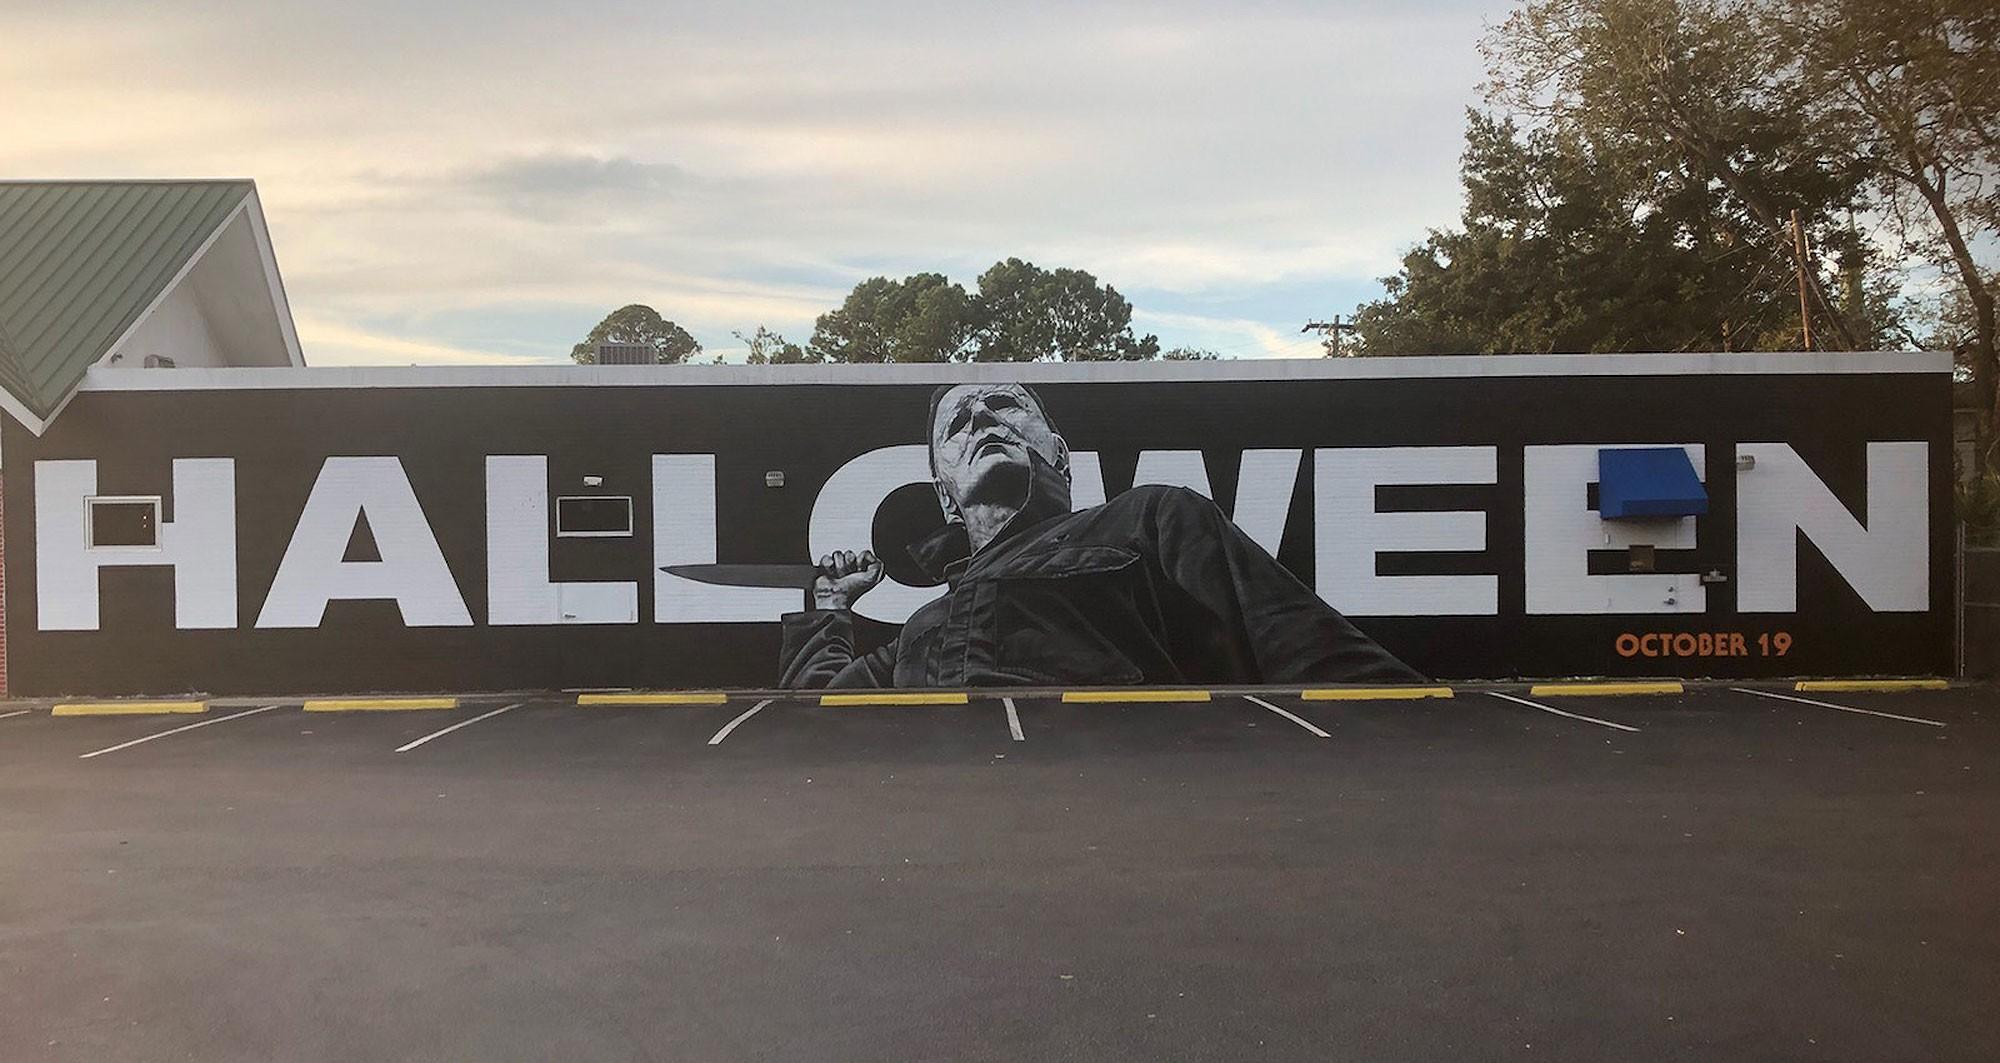 Halloween 2020 Filming In Charleston Massive 'Halloween' mural appears in Avondale ahead of